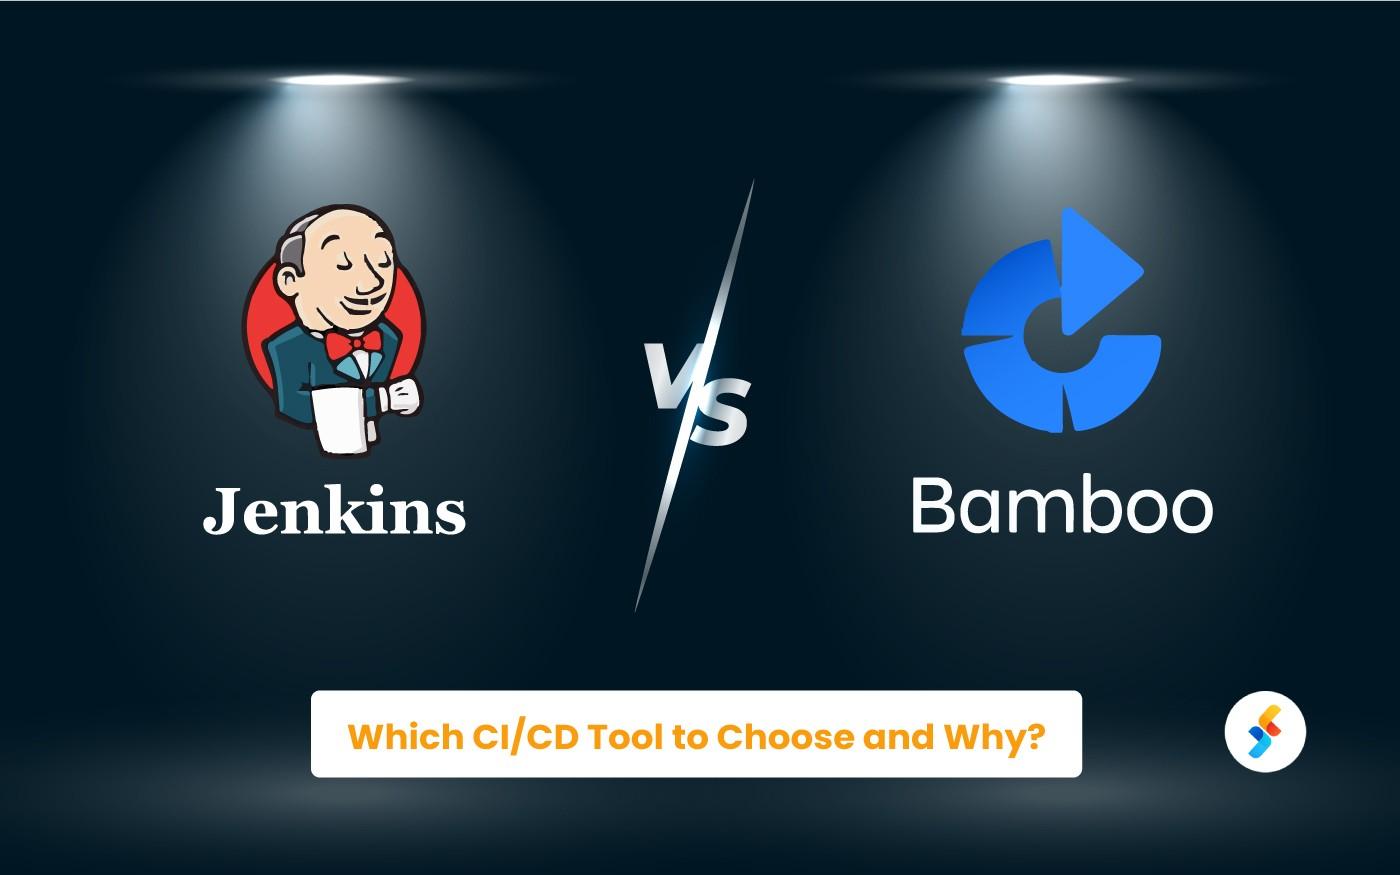 Bamboo vs Jenkins